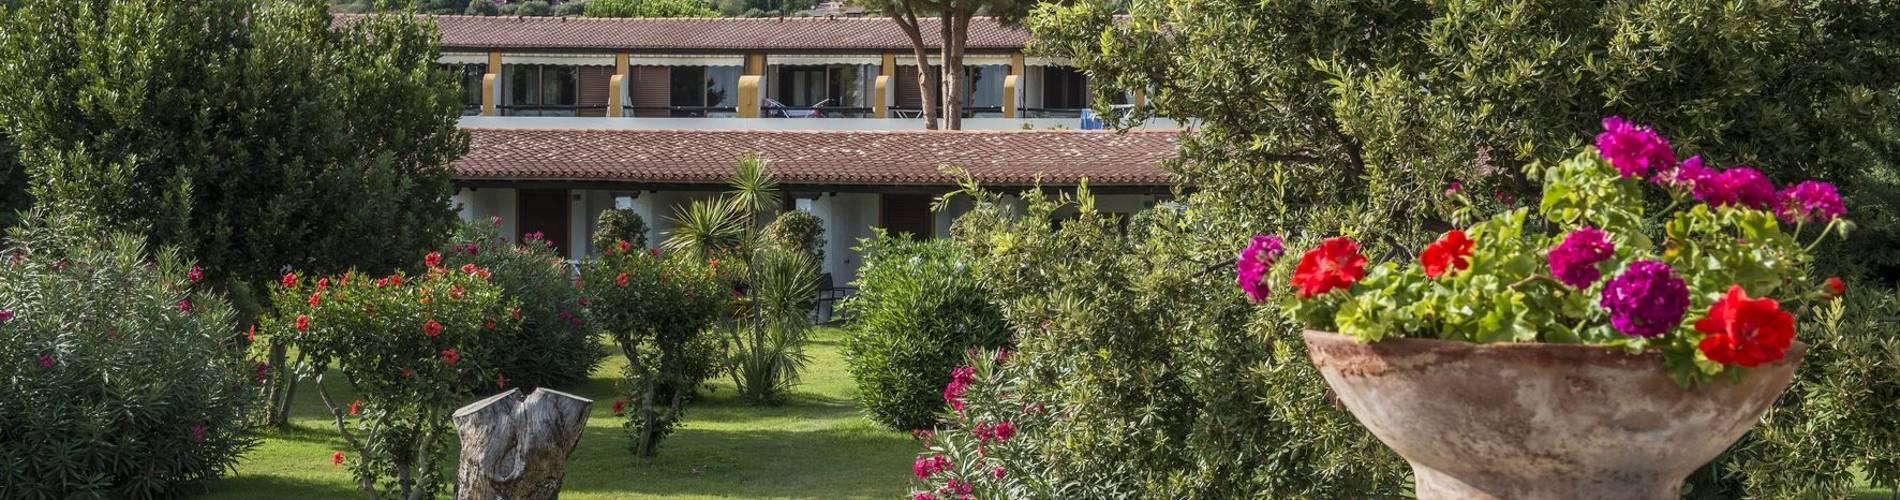 Hotel Cormoran, Villasimius